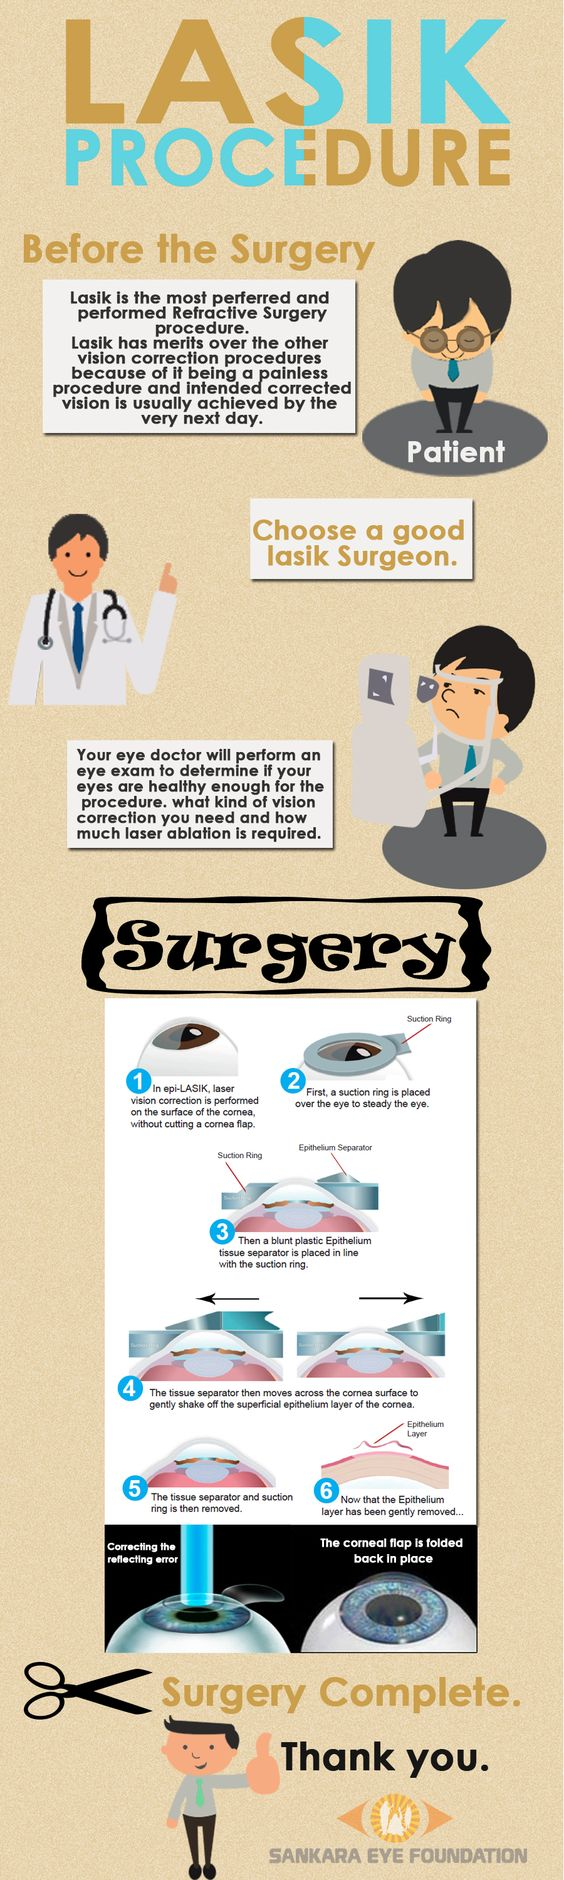 About Lasik Surgery